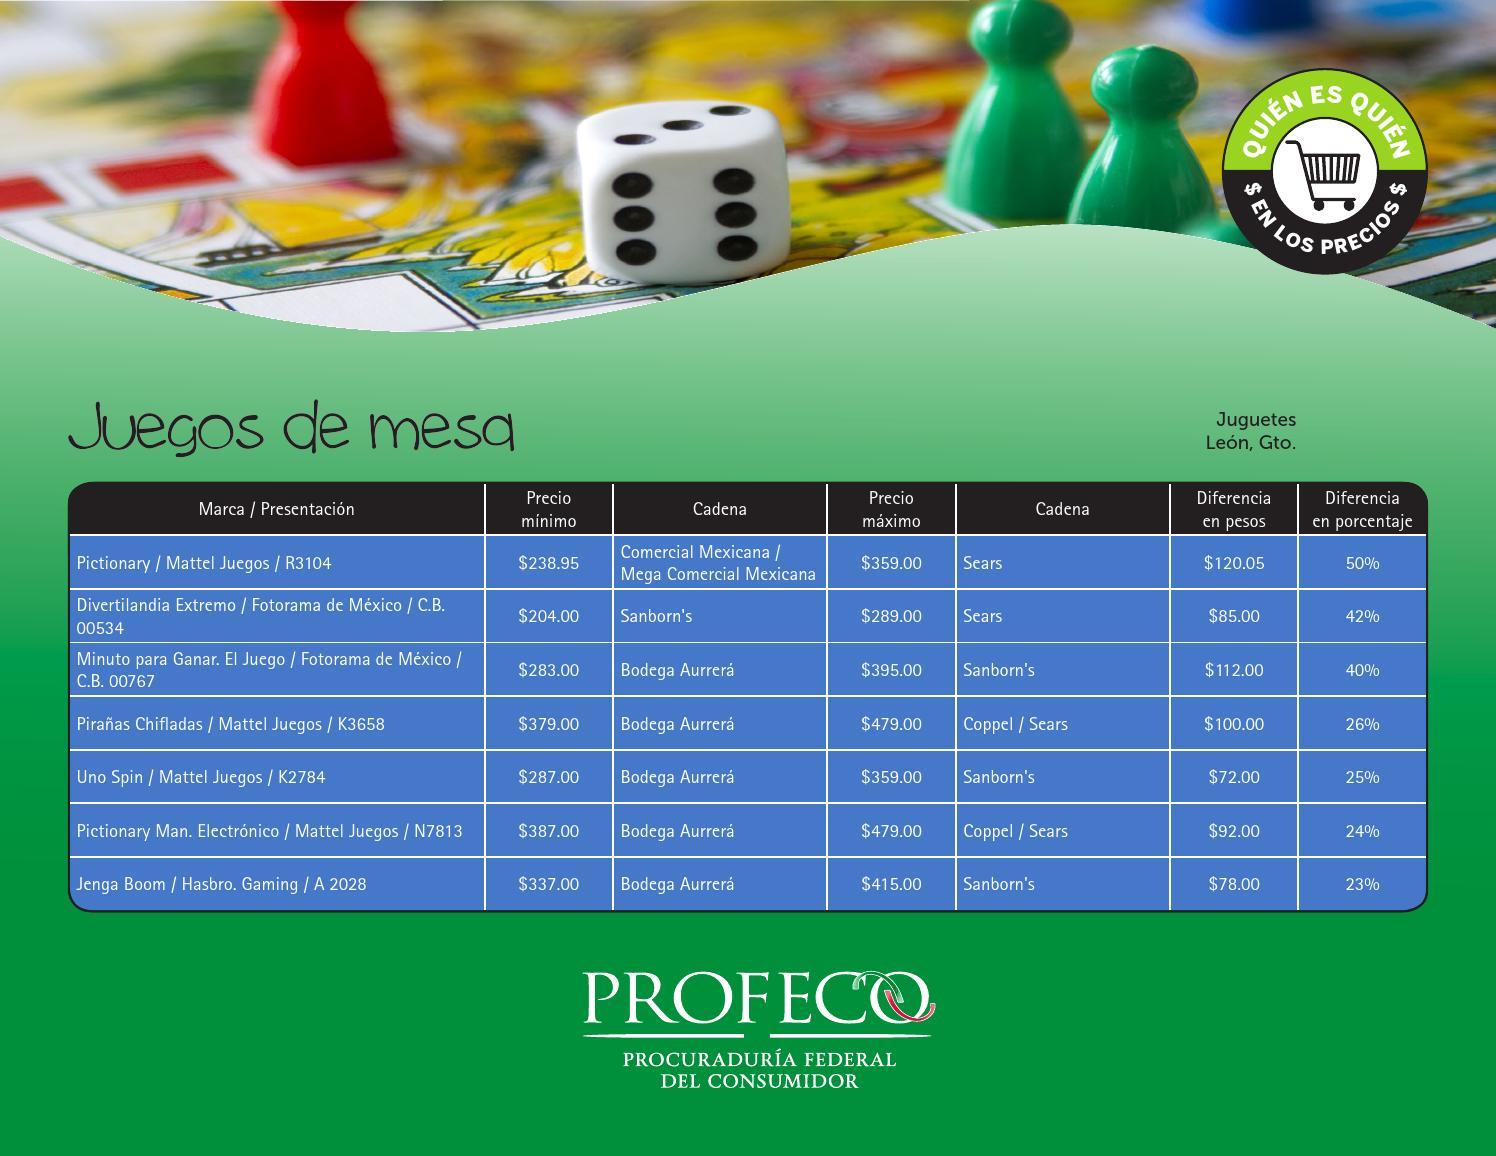 Juguetes Leon 2 By Profeco Issuu